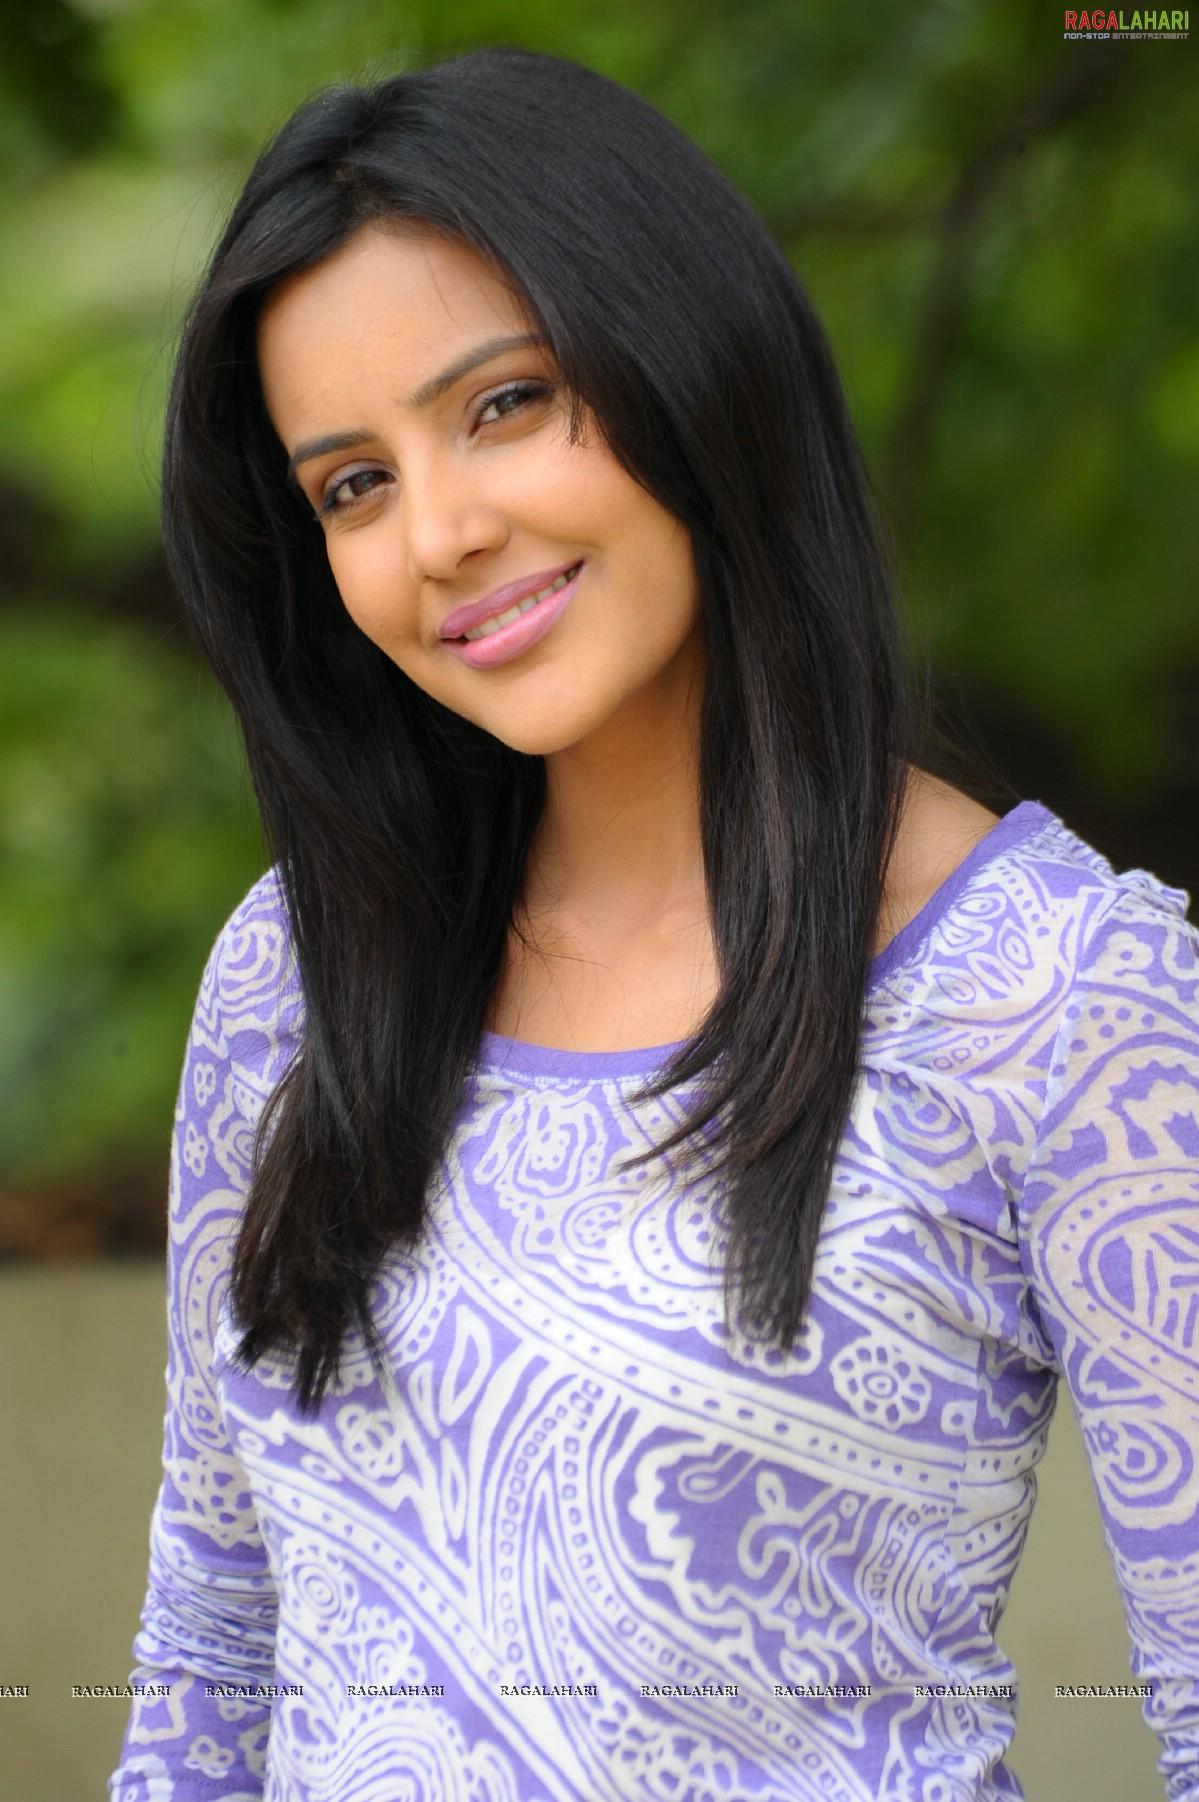 priya anand (hi-res) image 6 | telugu actress photo gallery,images